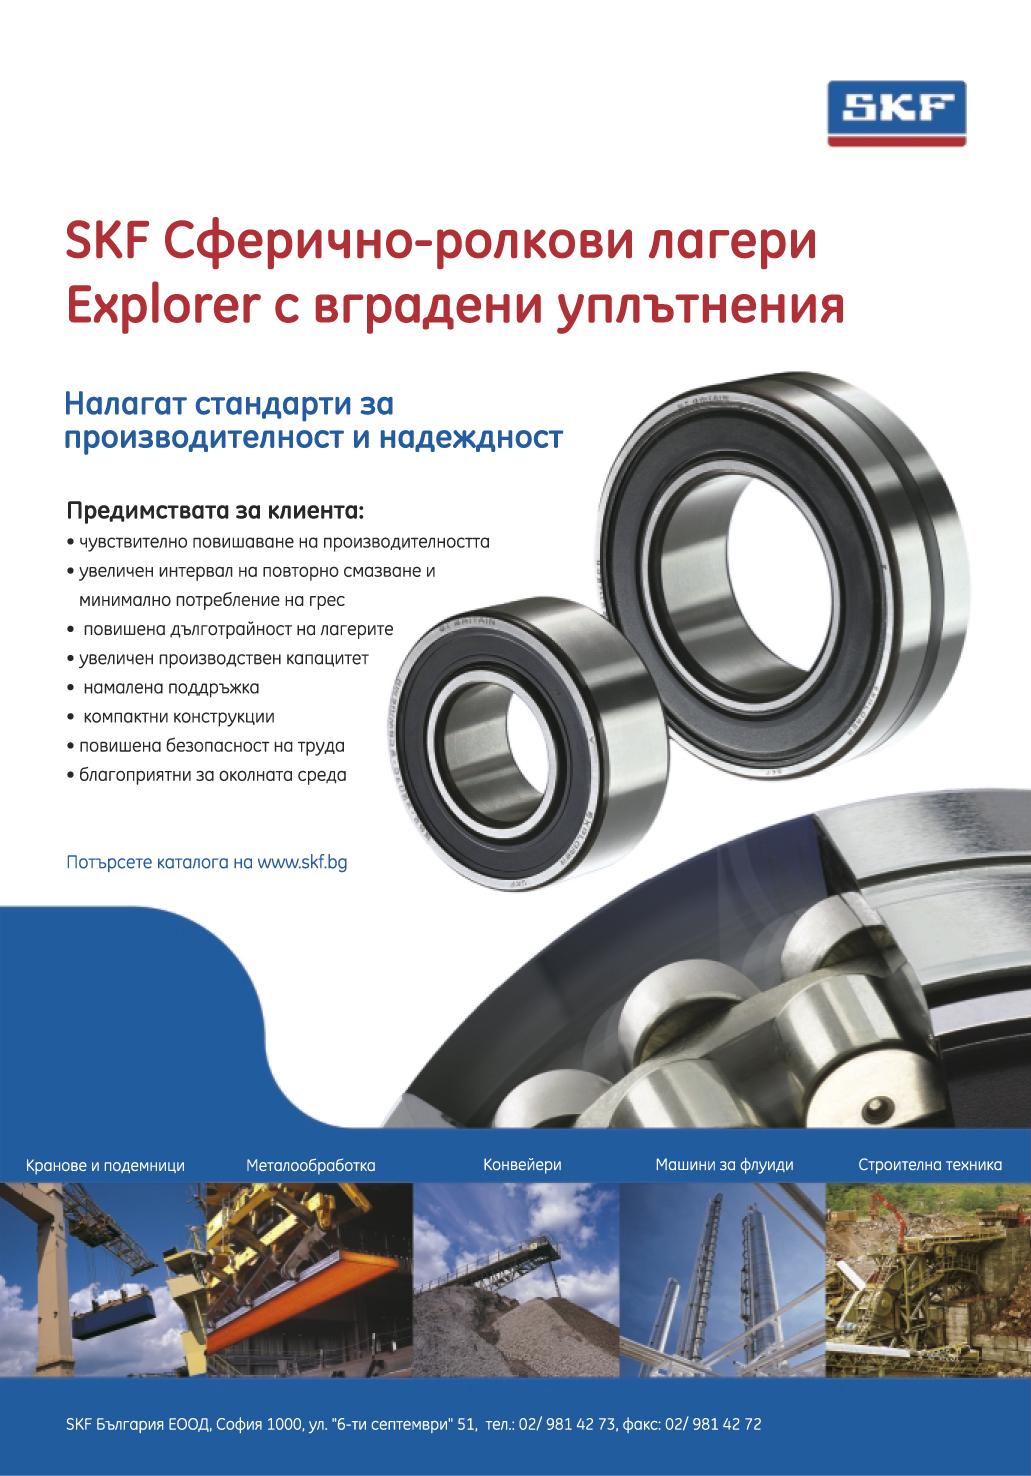 СКФ България